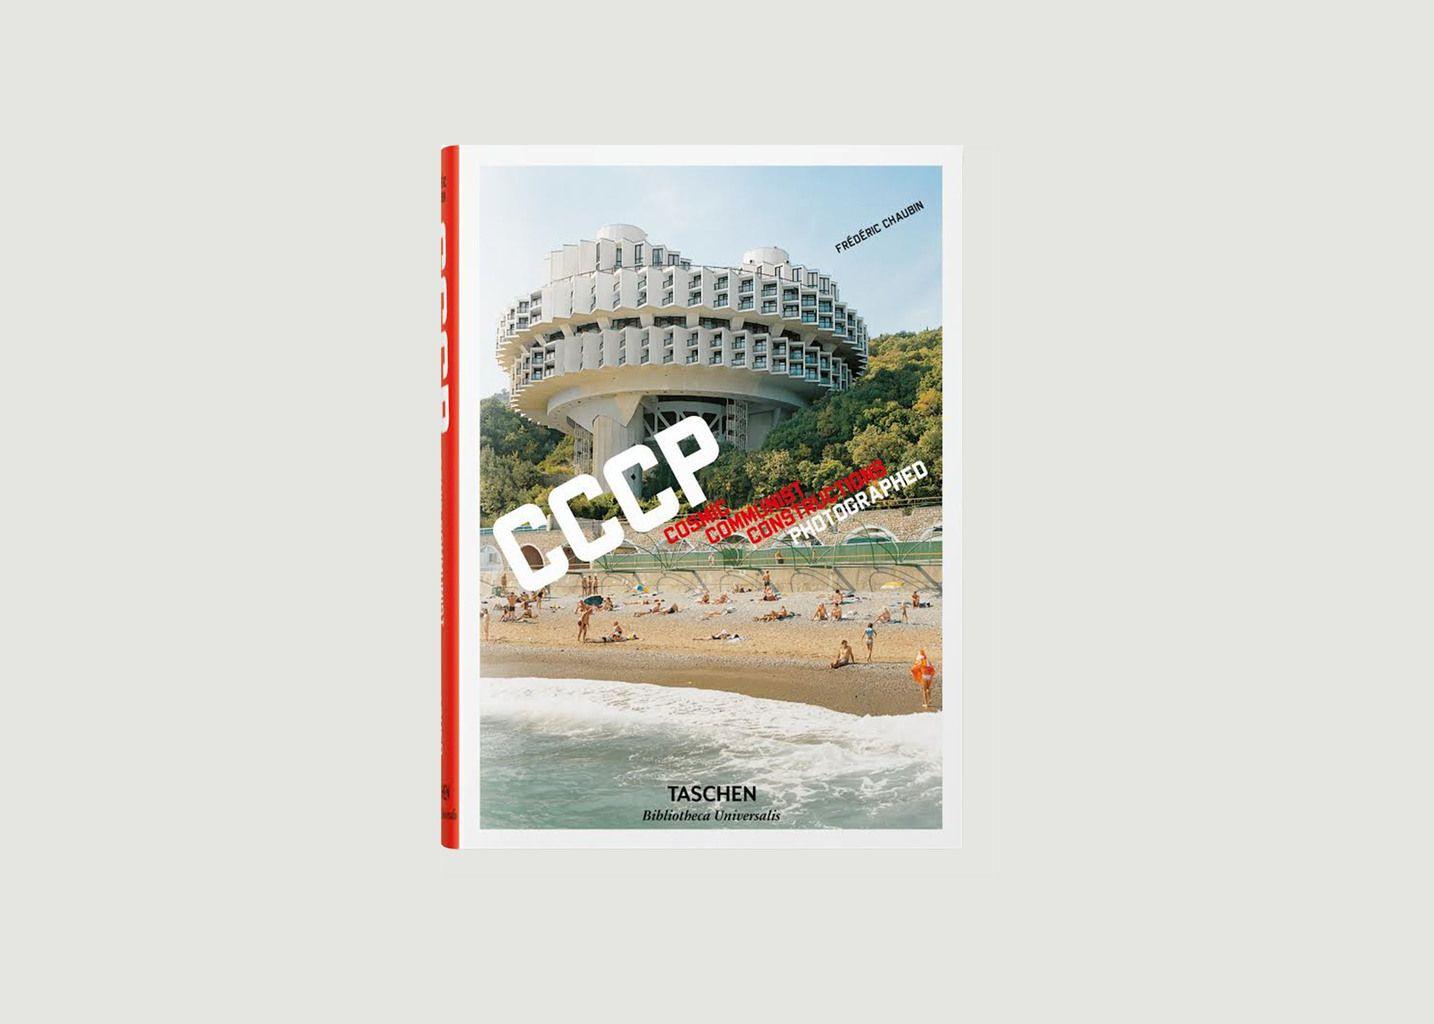 Chaubin, CCCP  - Taschen